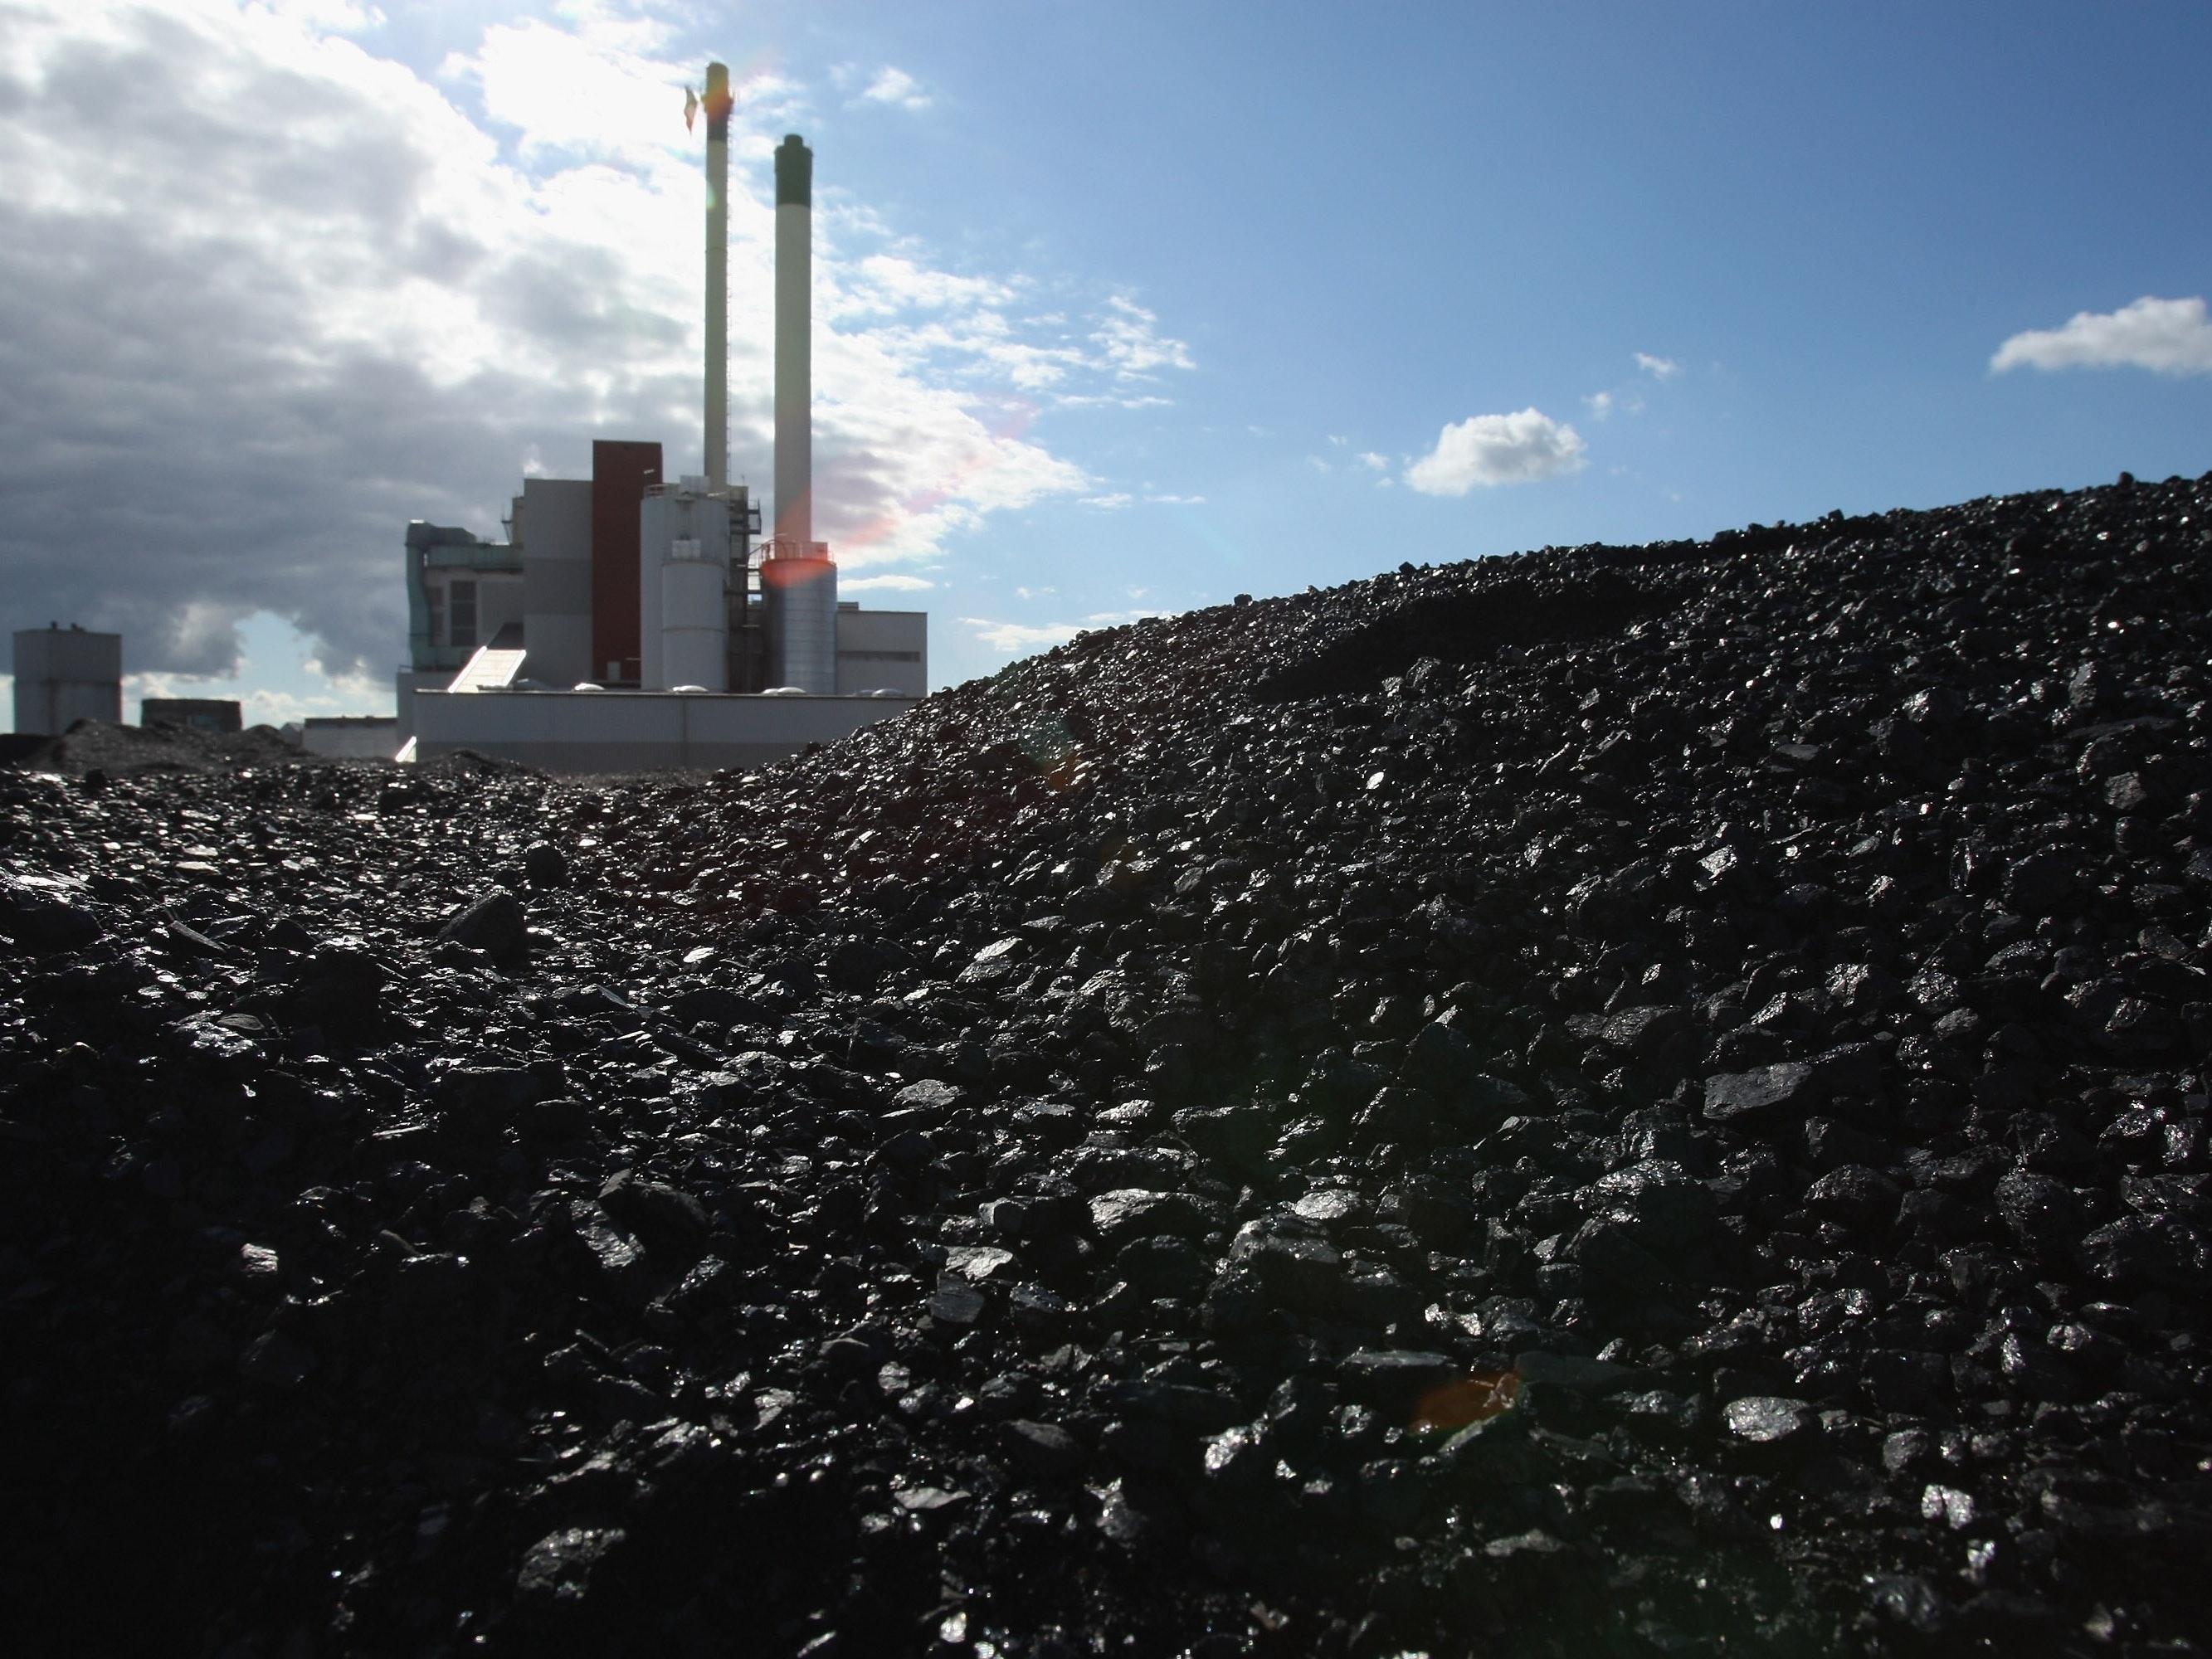 Democrats Didn't Kill the Coal Industry, Technology Did